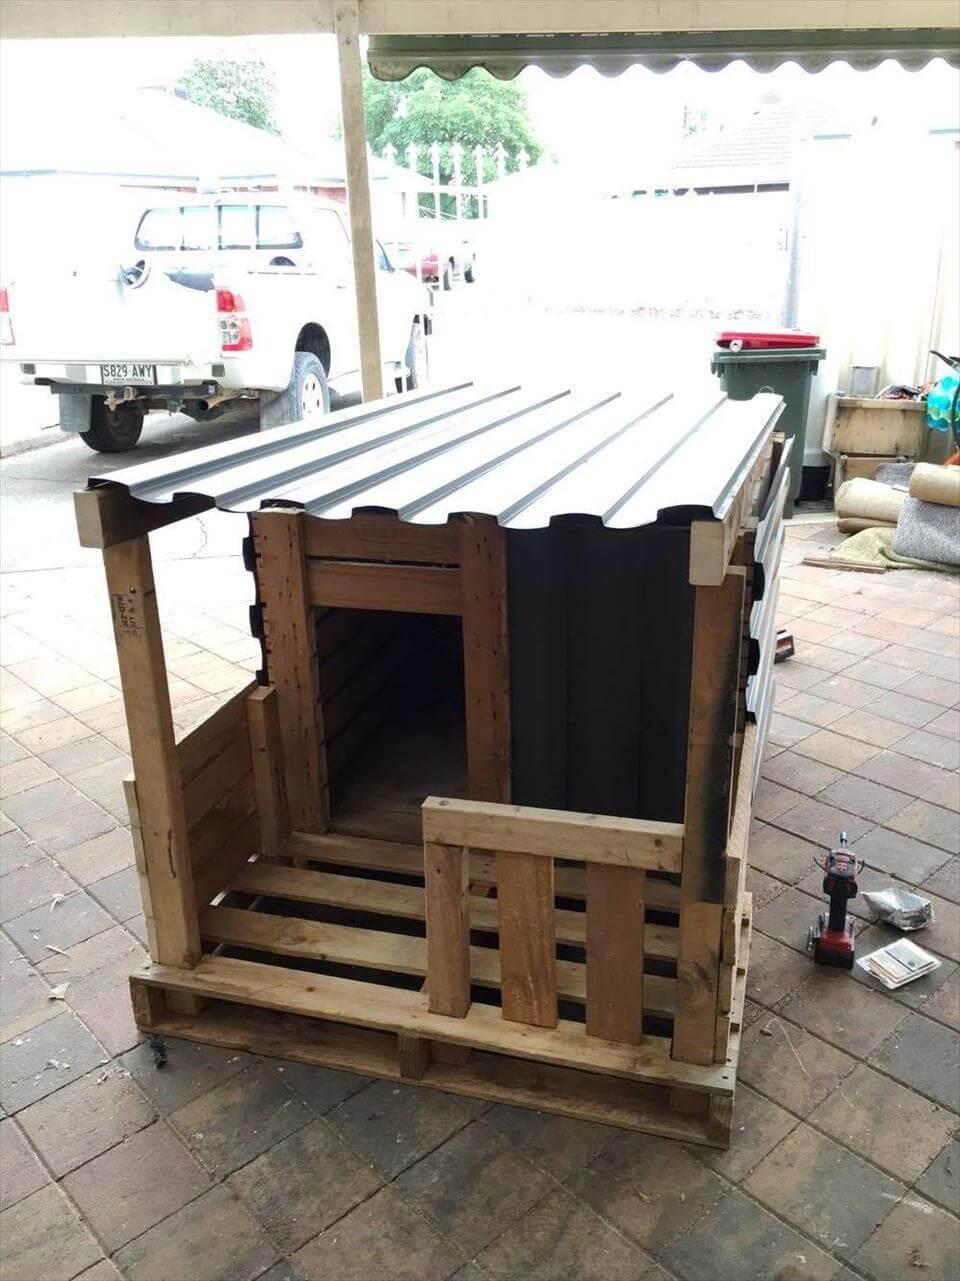 Pallet Dog House With Veranda Diy 101 Pallet Ideas